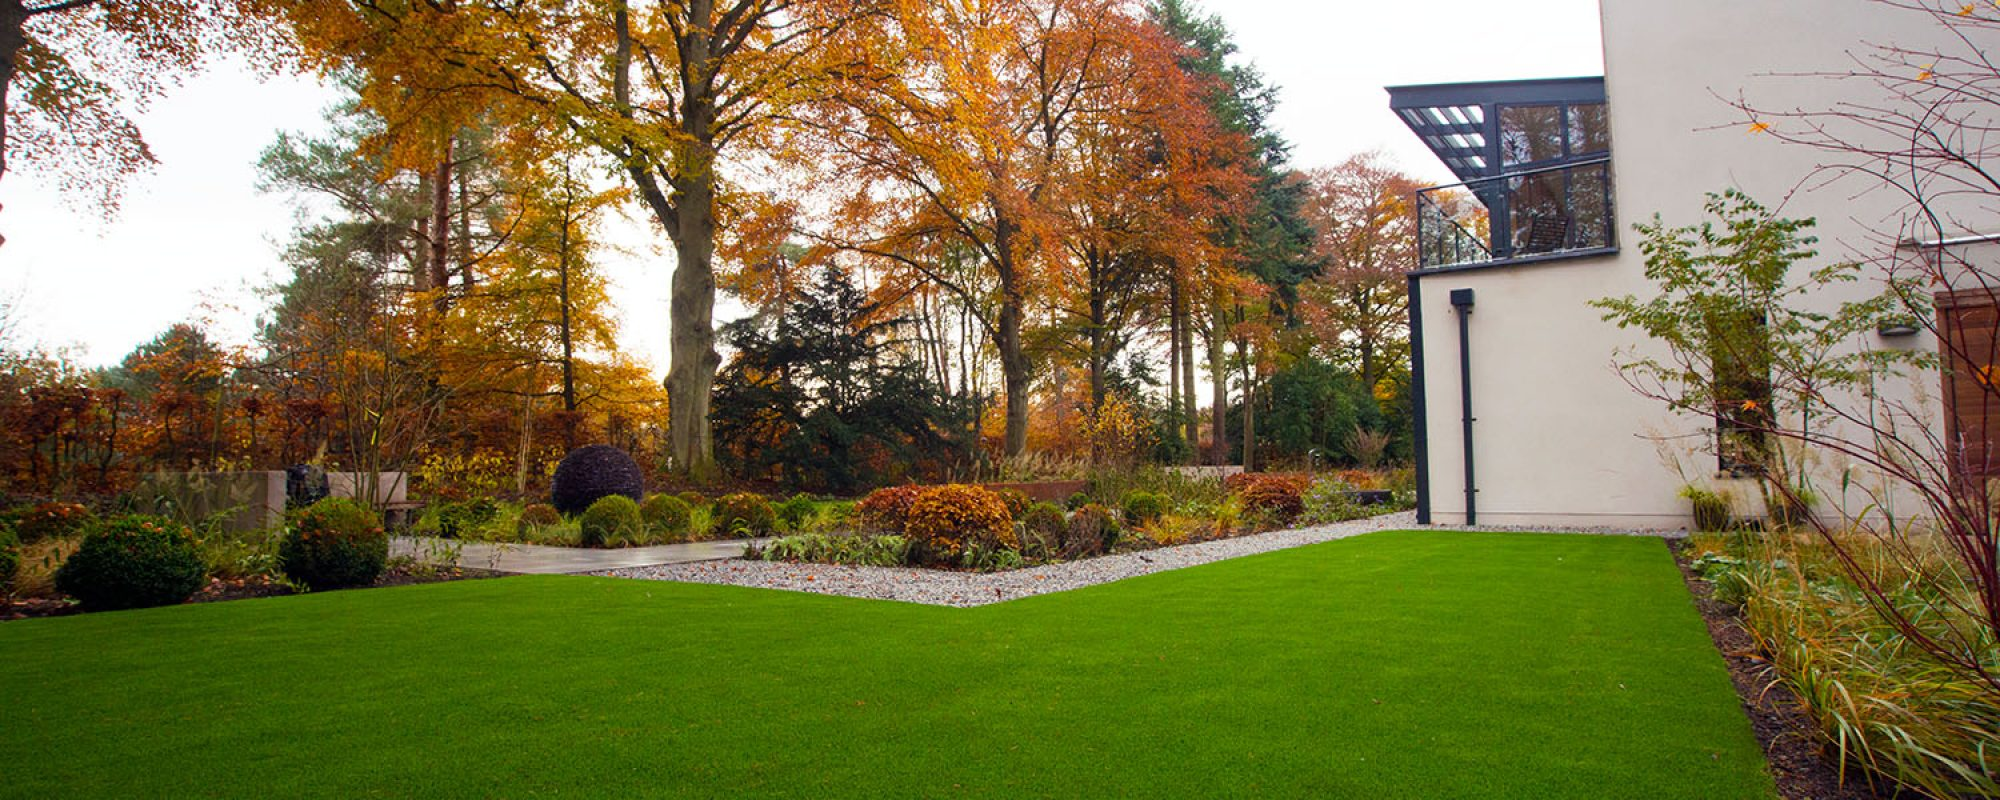 10 Low Maintenance Garden Ideas Lazylawn